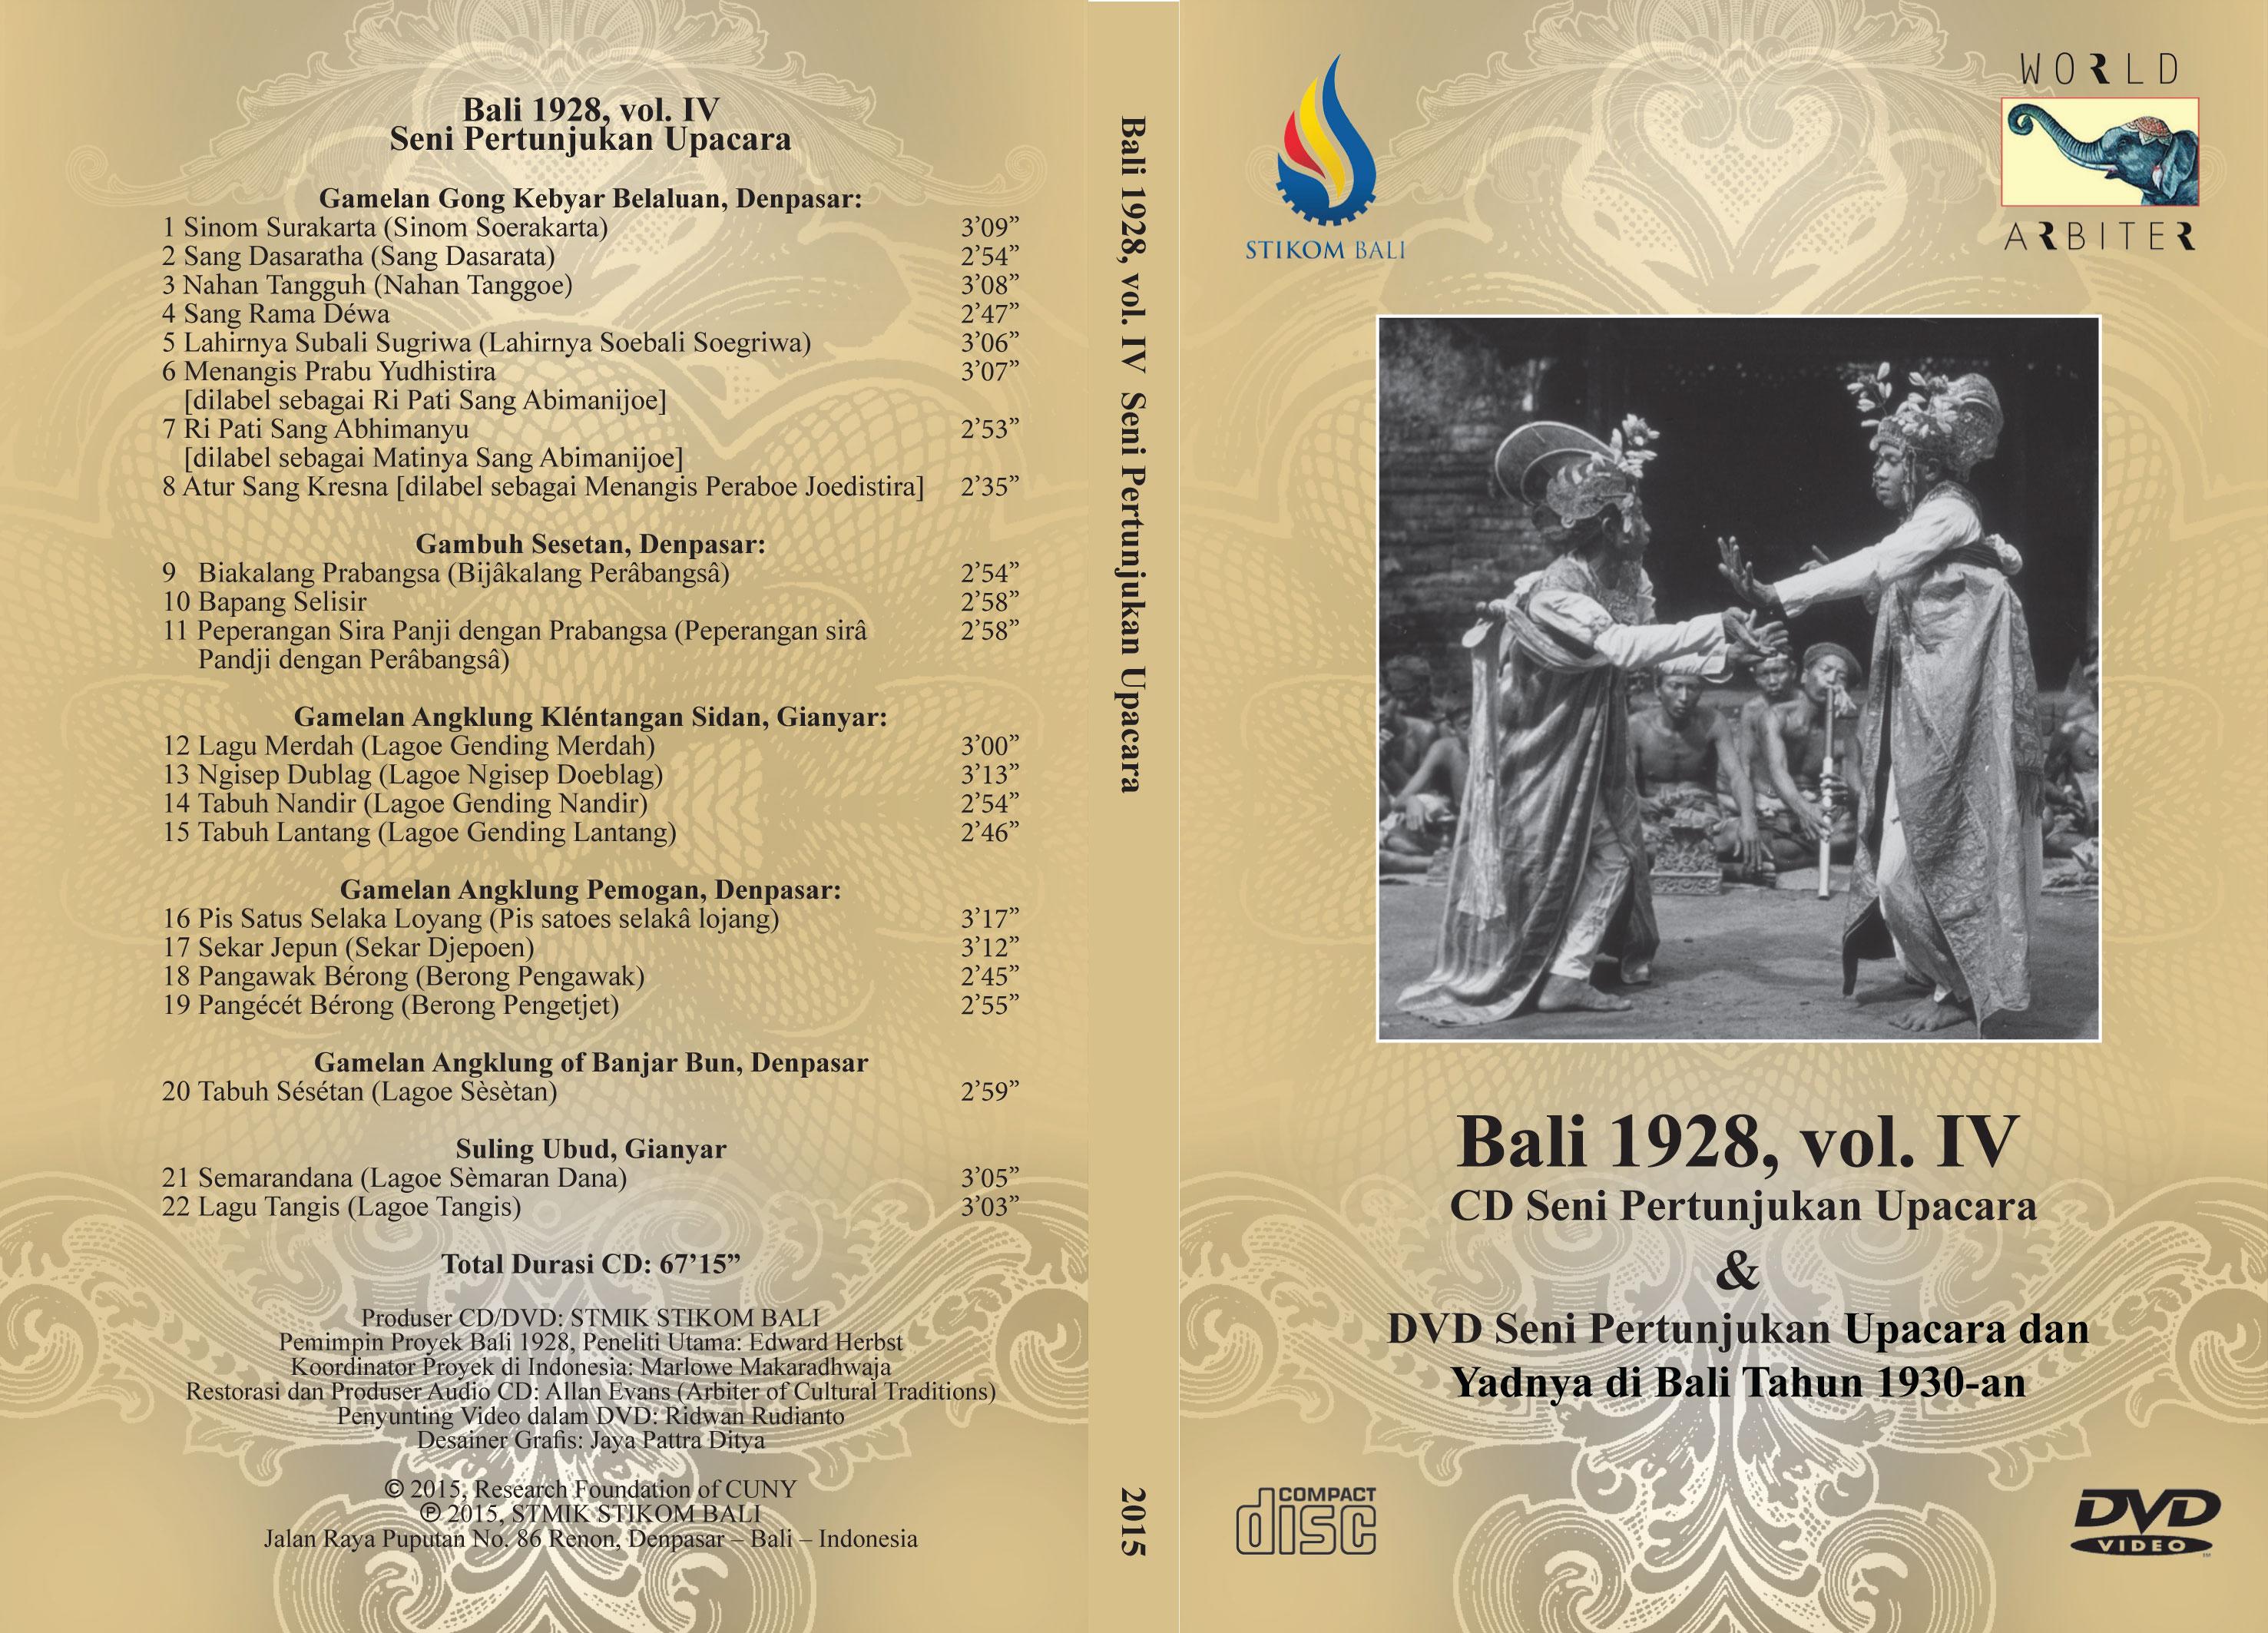 Bali-1928-Vol-IV